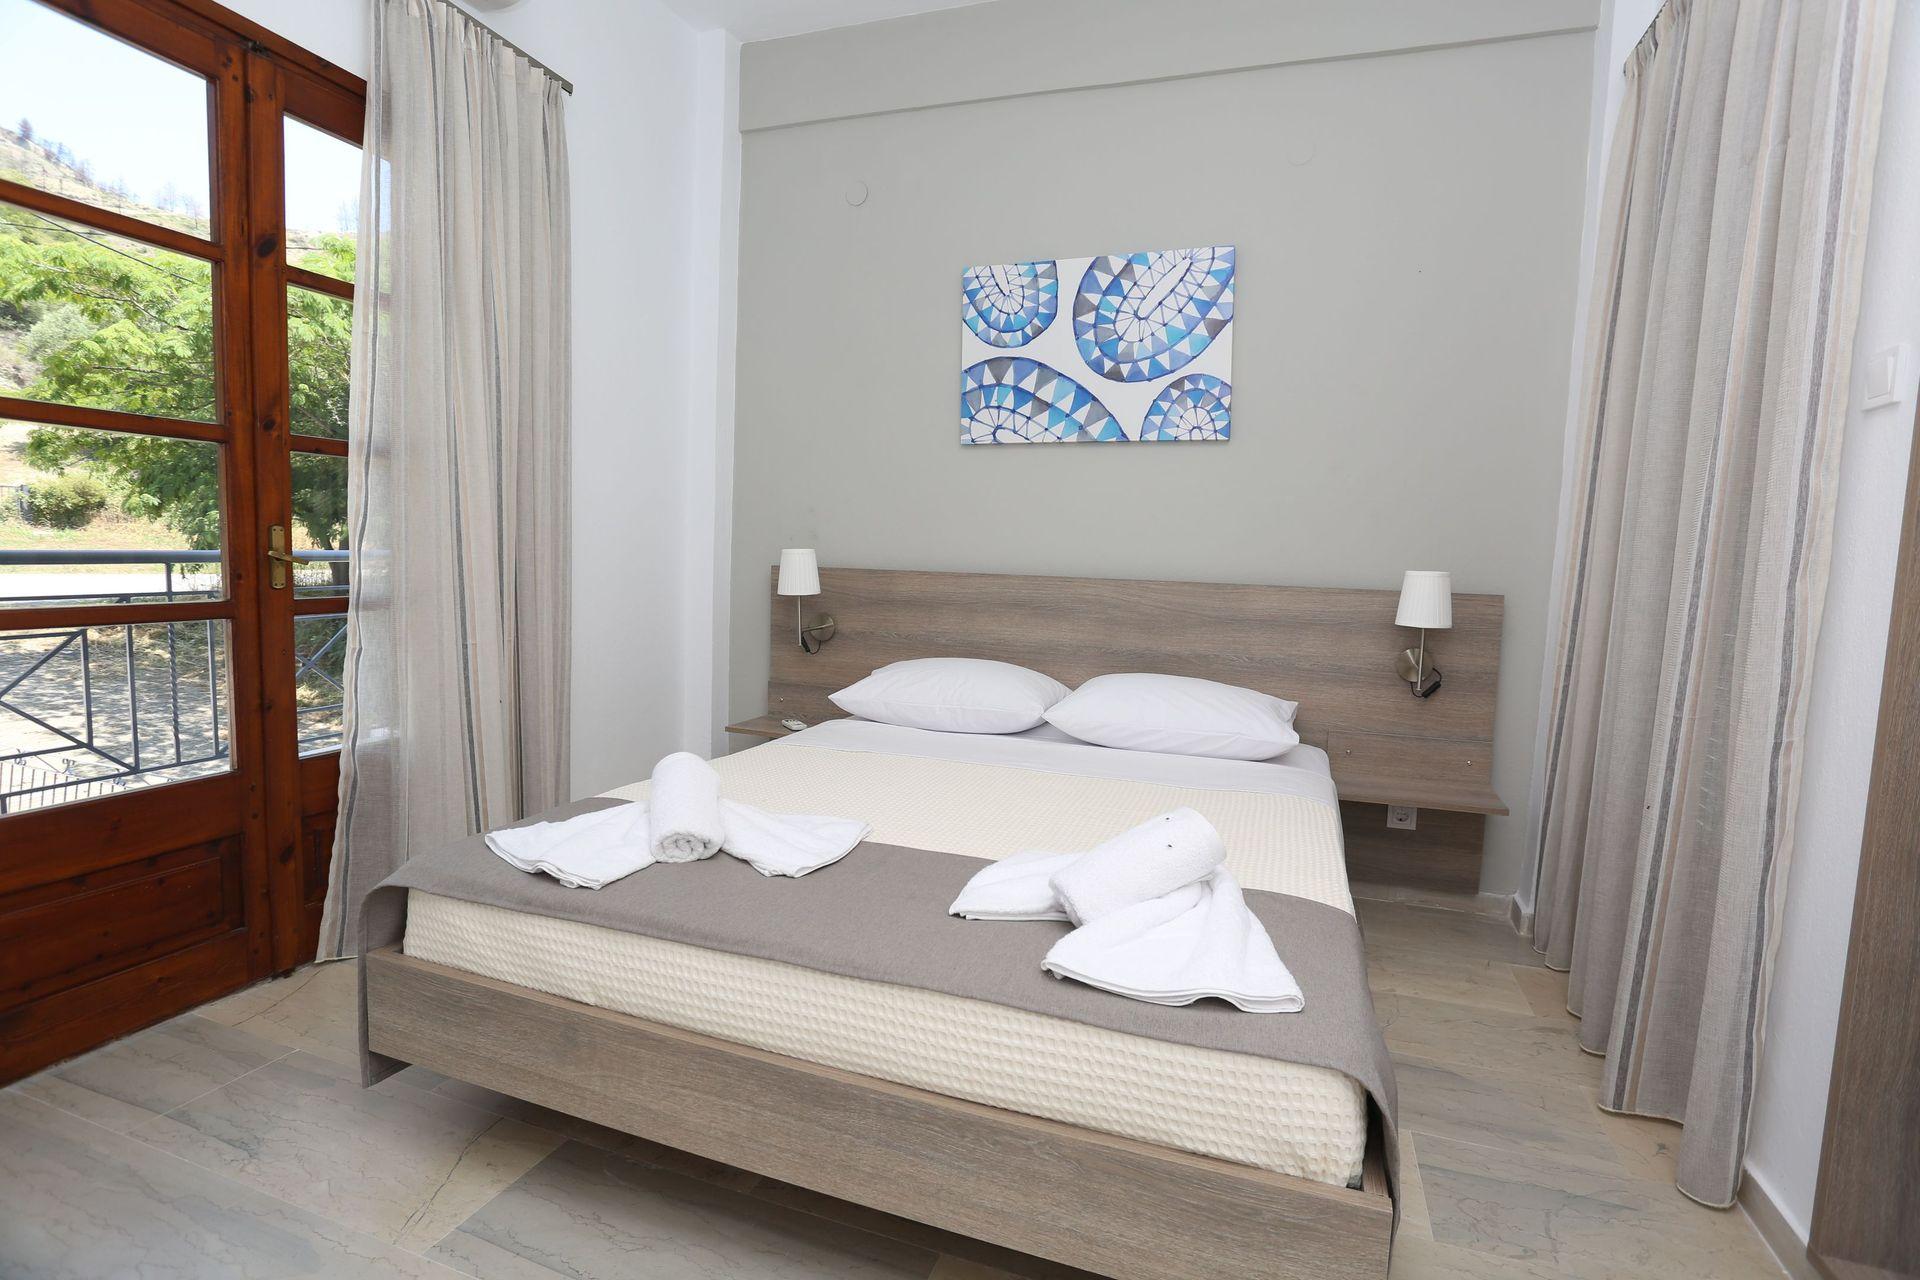 Astron Hotel - Μόλα Καλύβα, Χαλκιδική ✦ 2 Ημέρες (1 Διανυκτέρευση) ✦ 2 άτομα ✦ Πρωινό ✦ 01/09/2021 έως 30/09/2021 ✦ Κοντά στην παραλία!